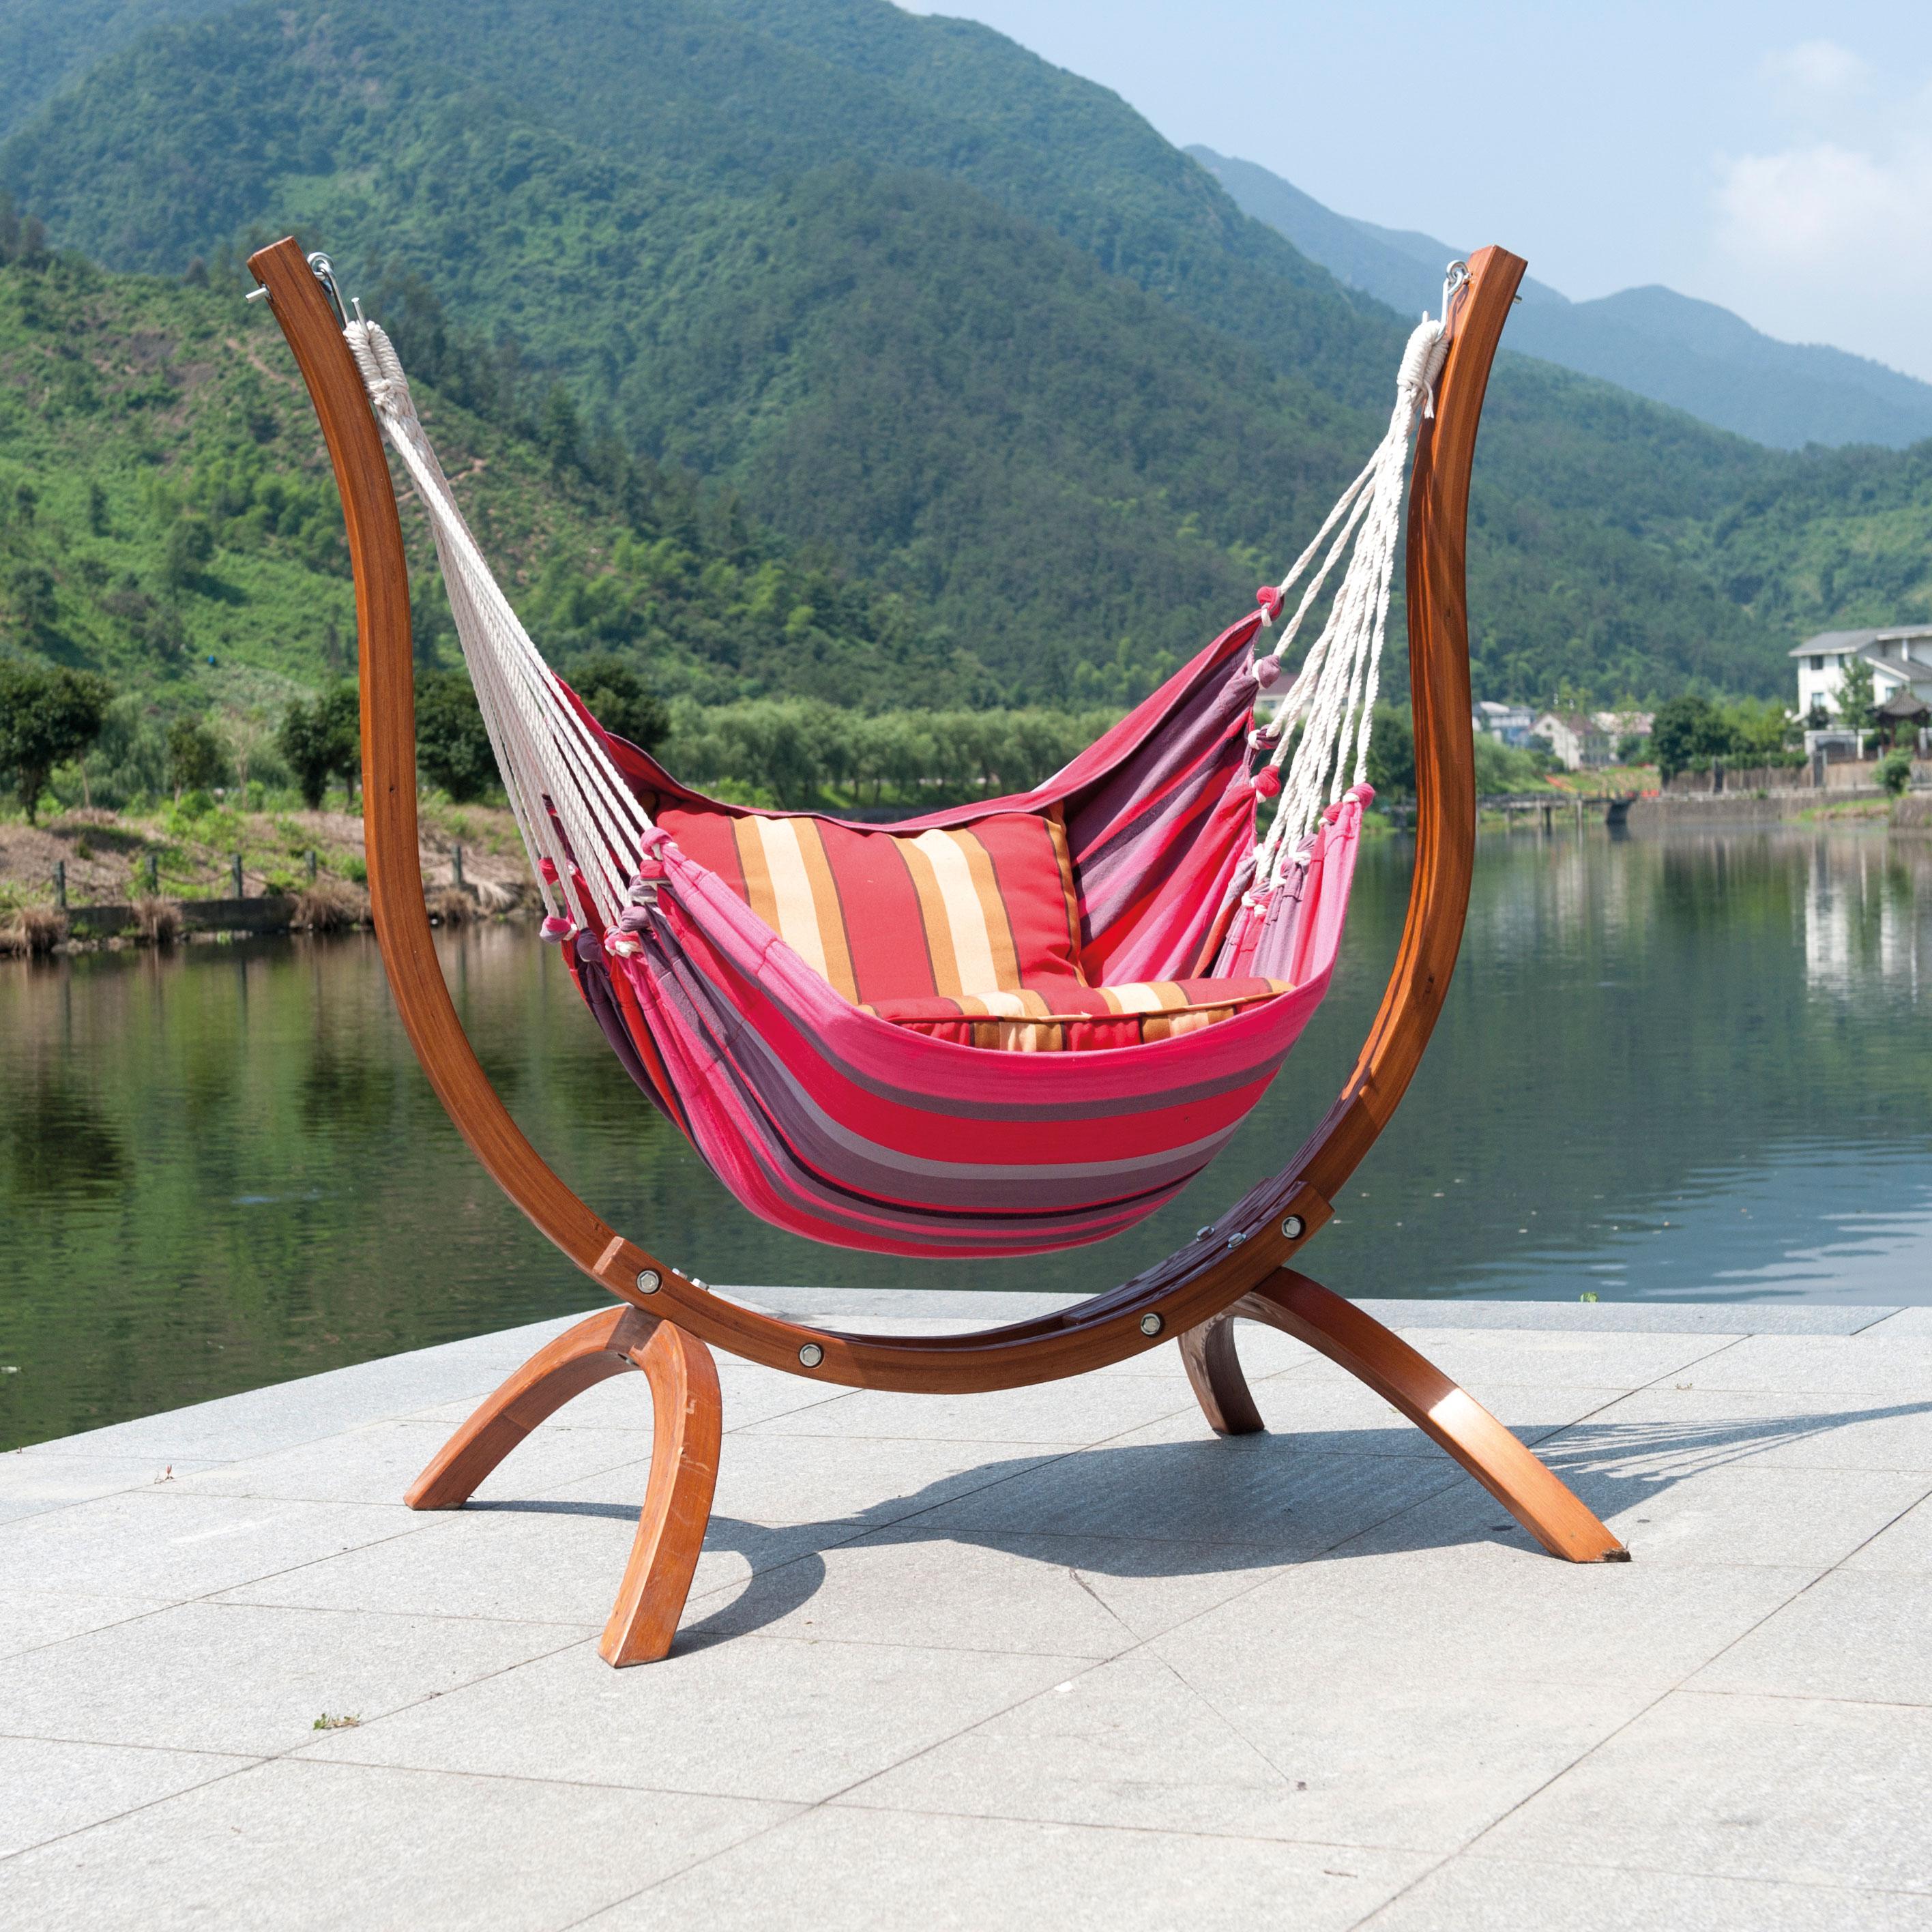 Ravenna Wooden Hammock Chair